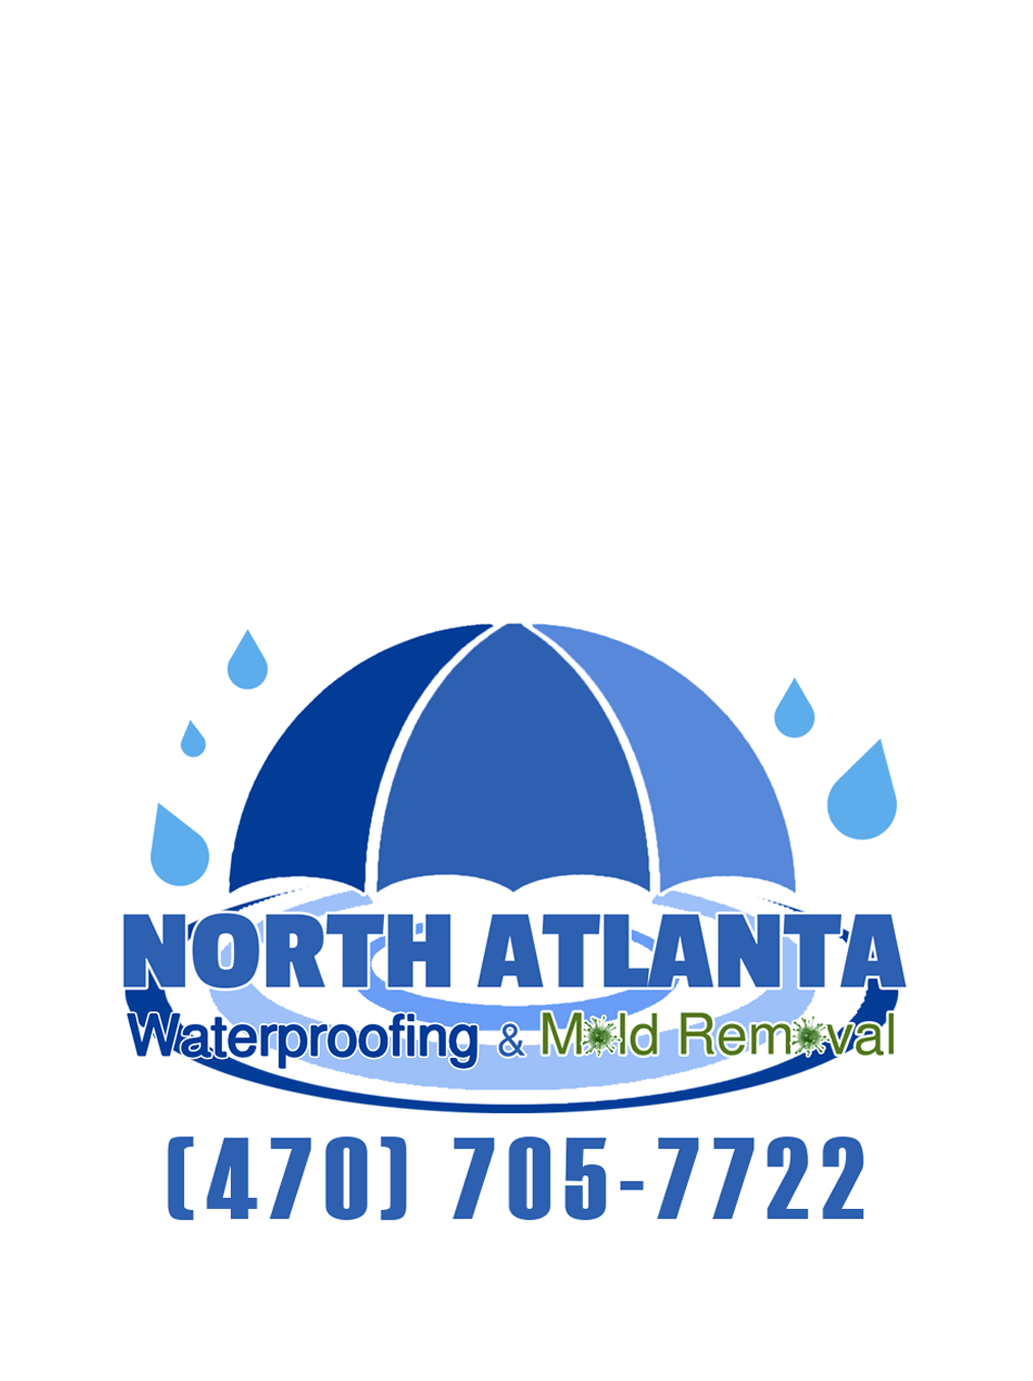 North Atlanta Waterproofing